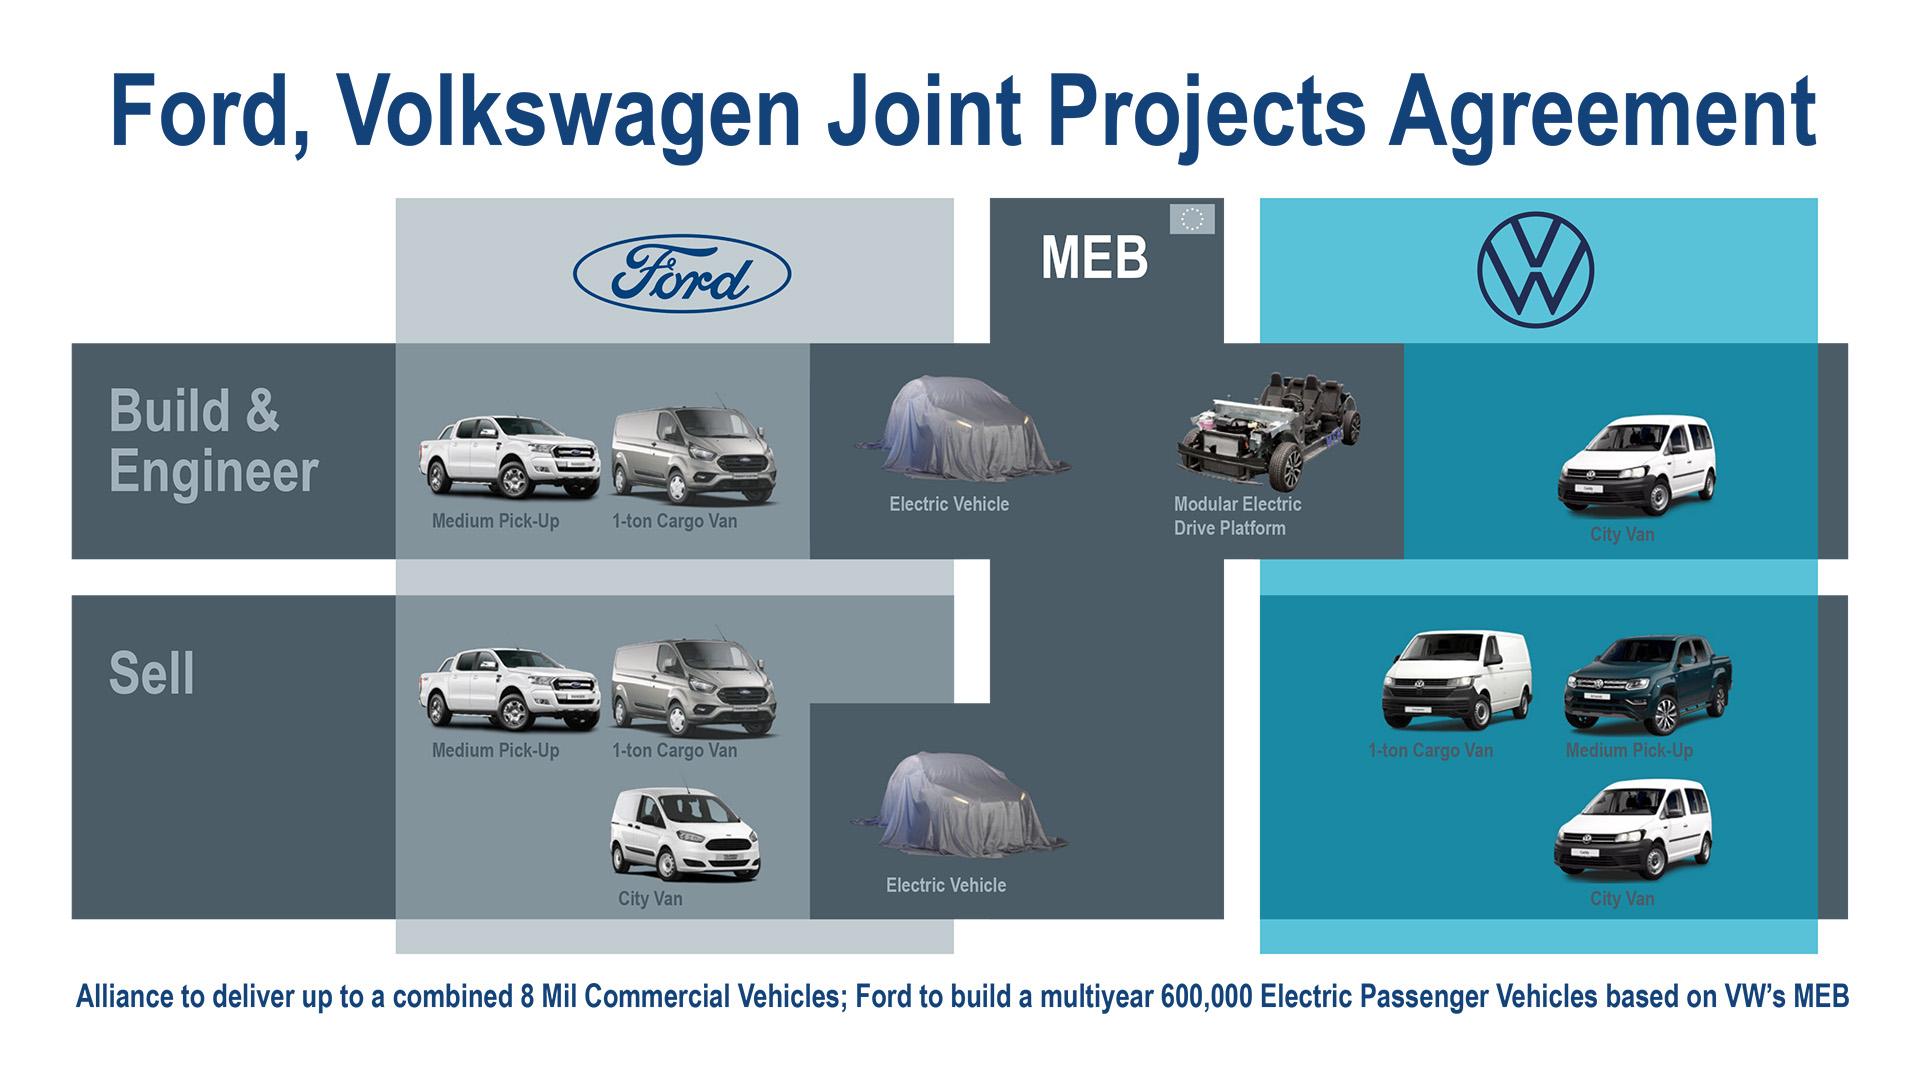 Ford-VW Alliance